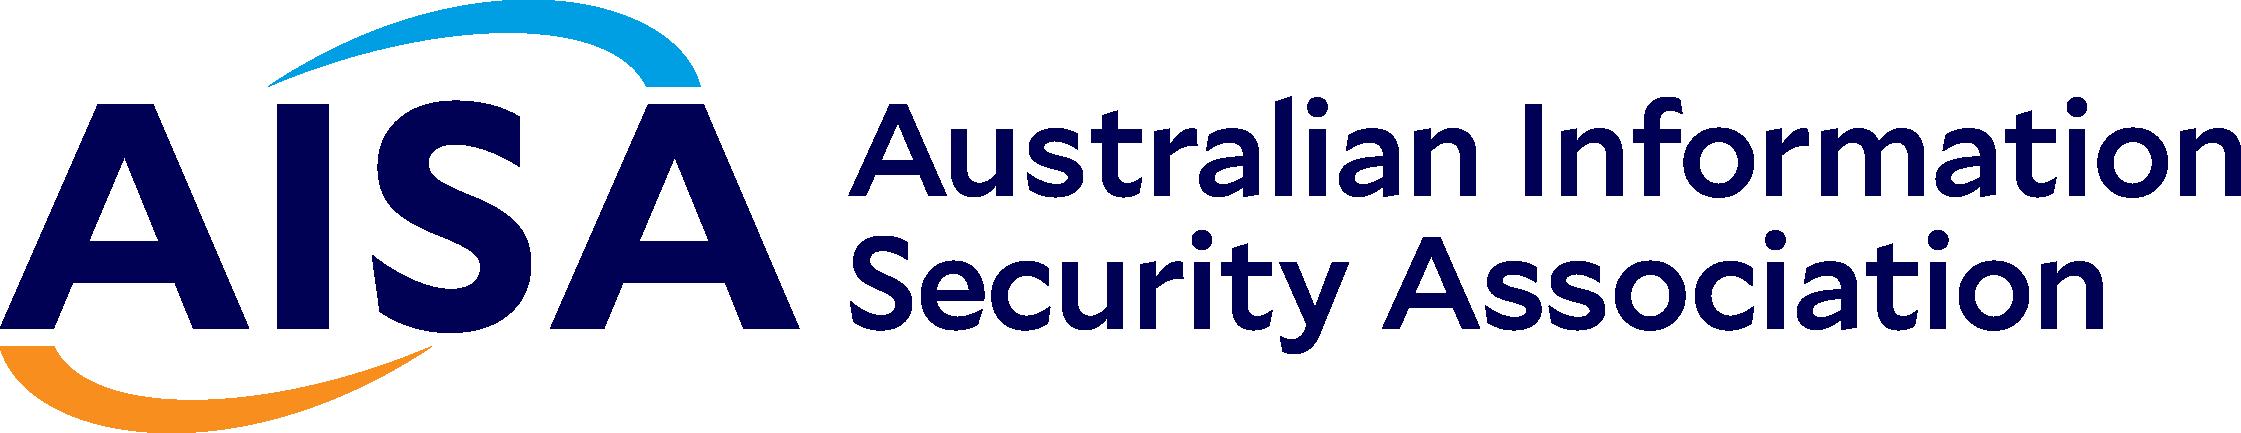 Australian Information Security Association